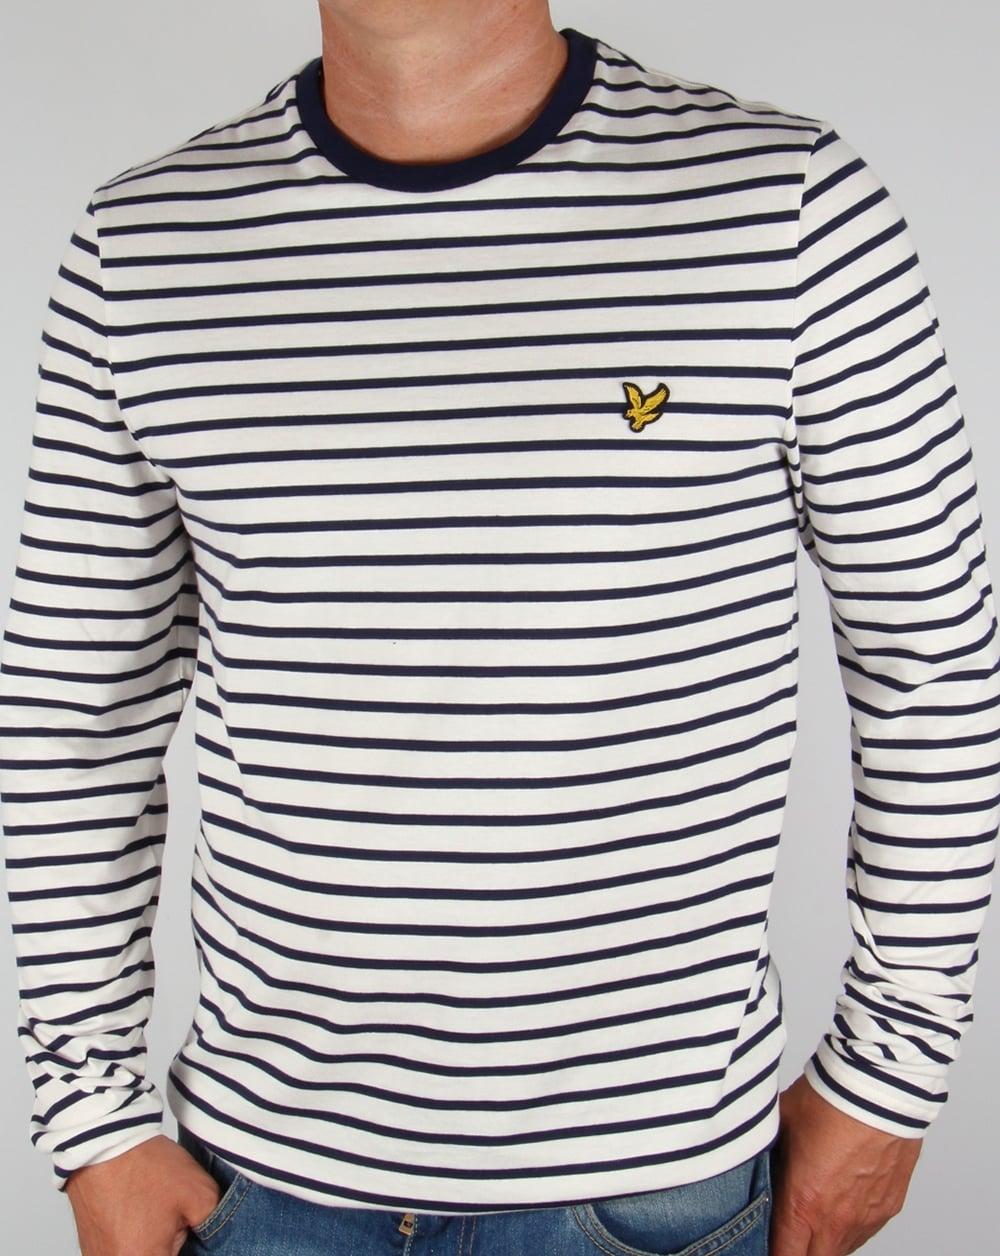 lyle and scott long sleeve breton stripe t shirt off white tee men 39 s crew neck. Black Bedroom Furniture Sets. Home Design Ideas